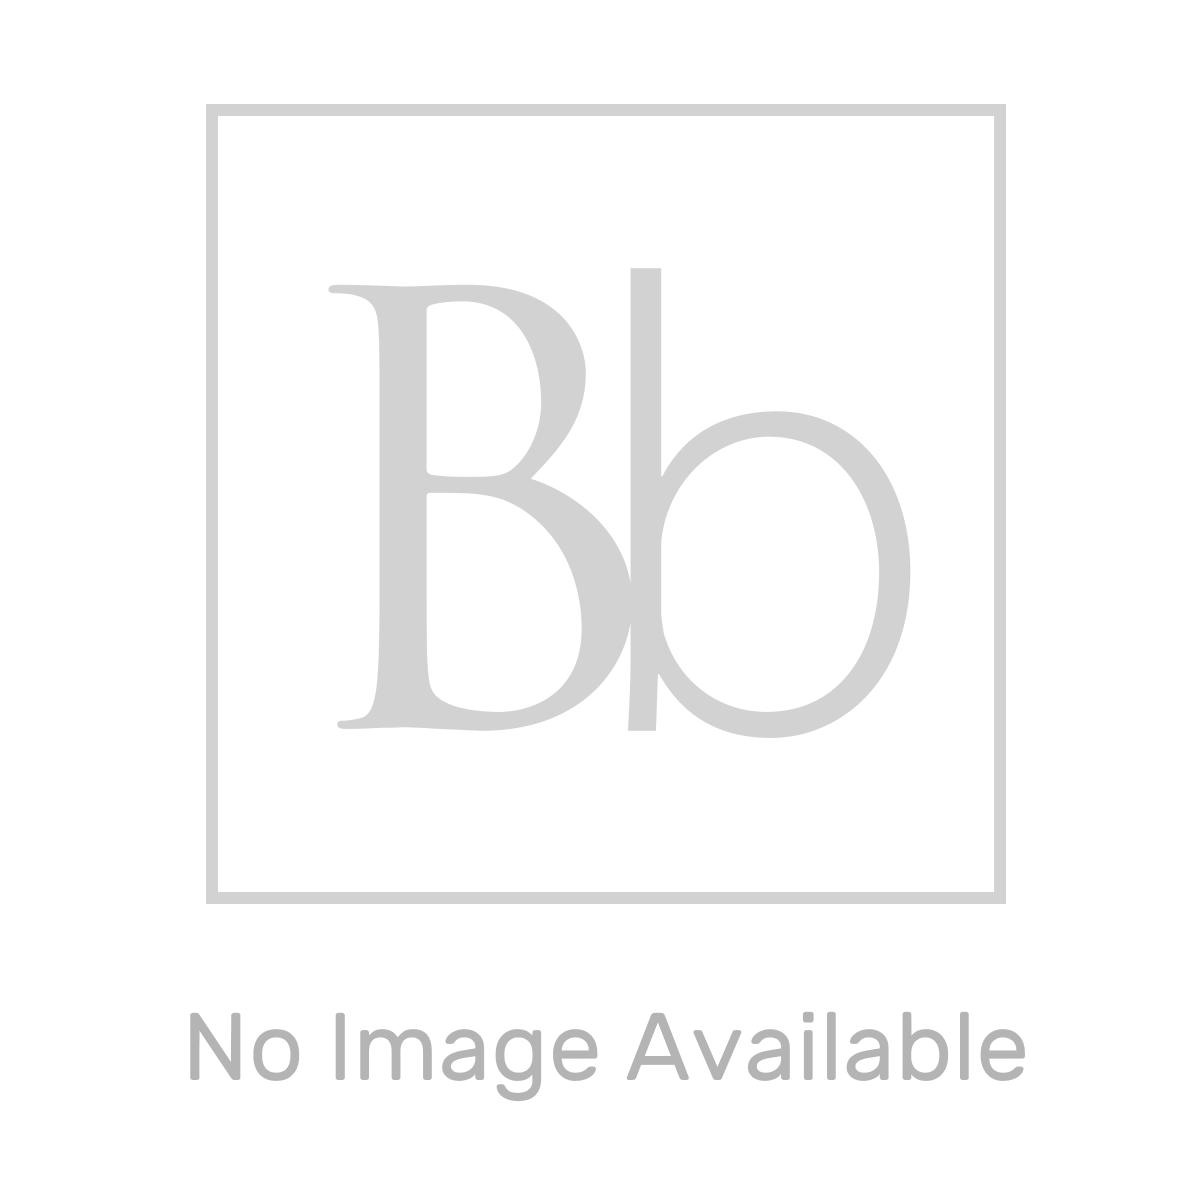 April Black Slate Shower Tray 1600 x 900 Line Drawing